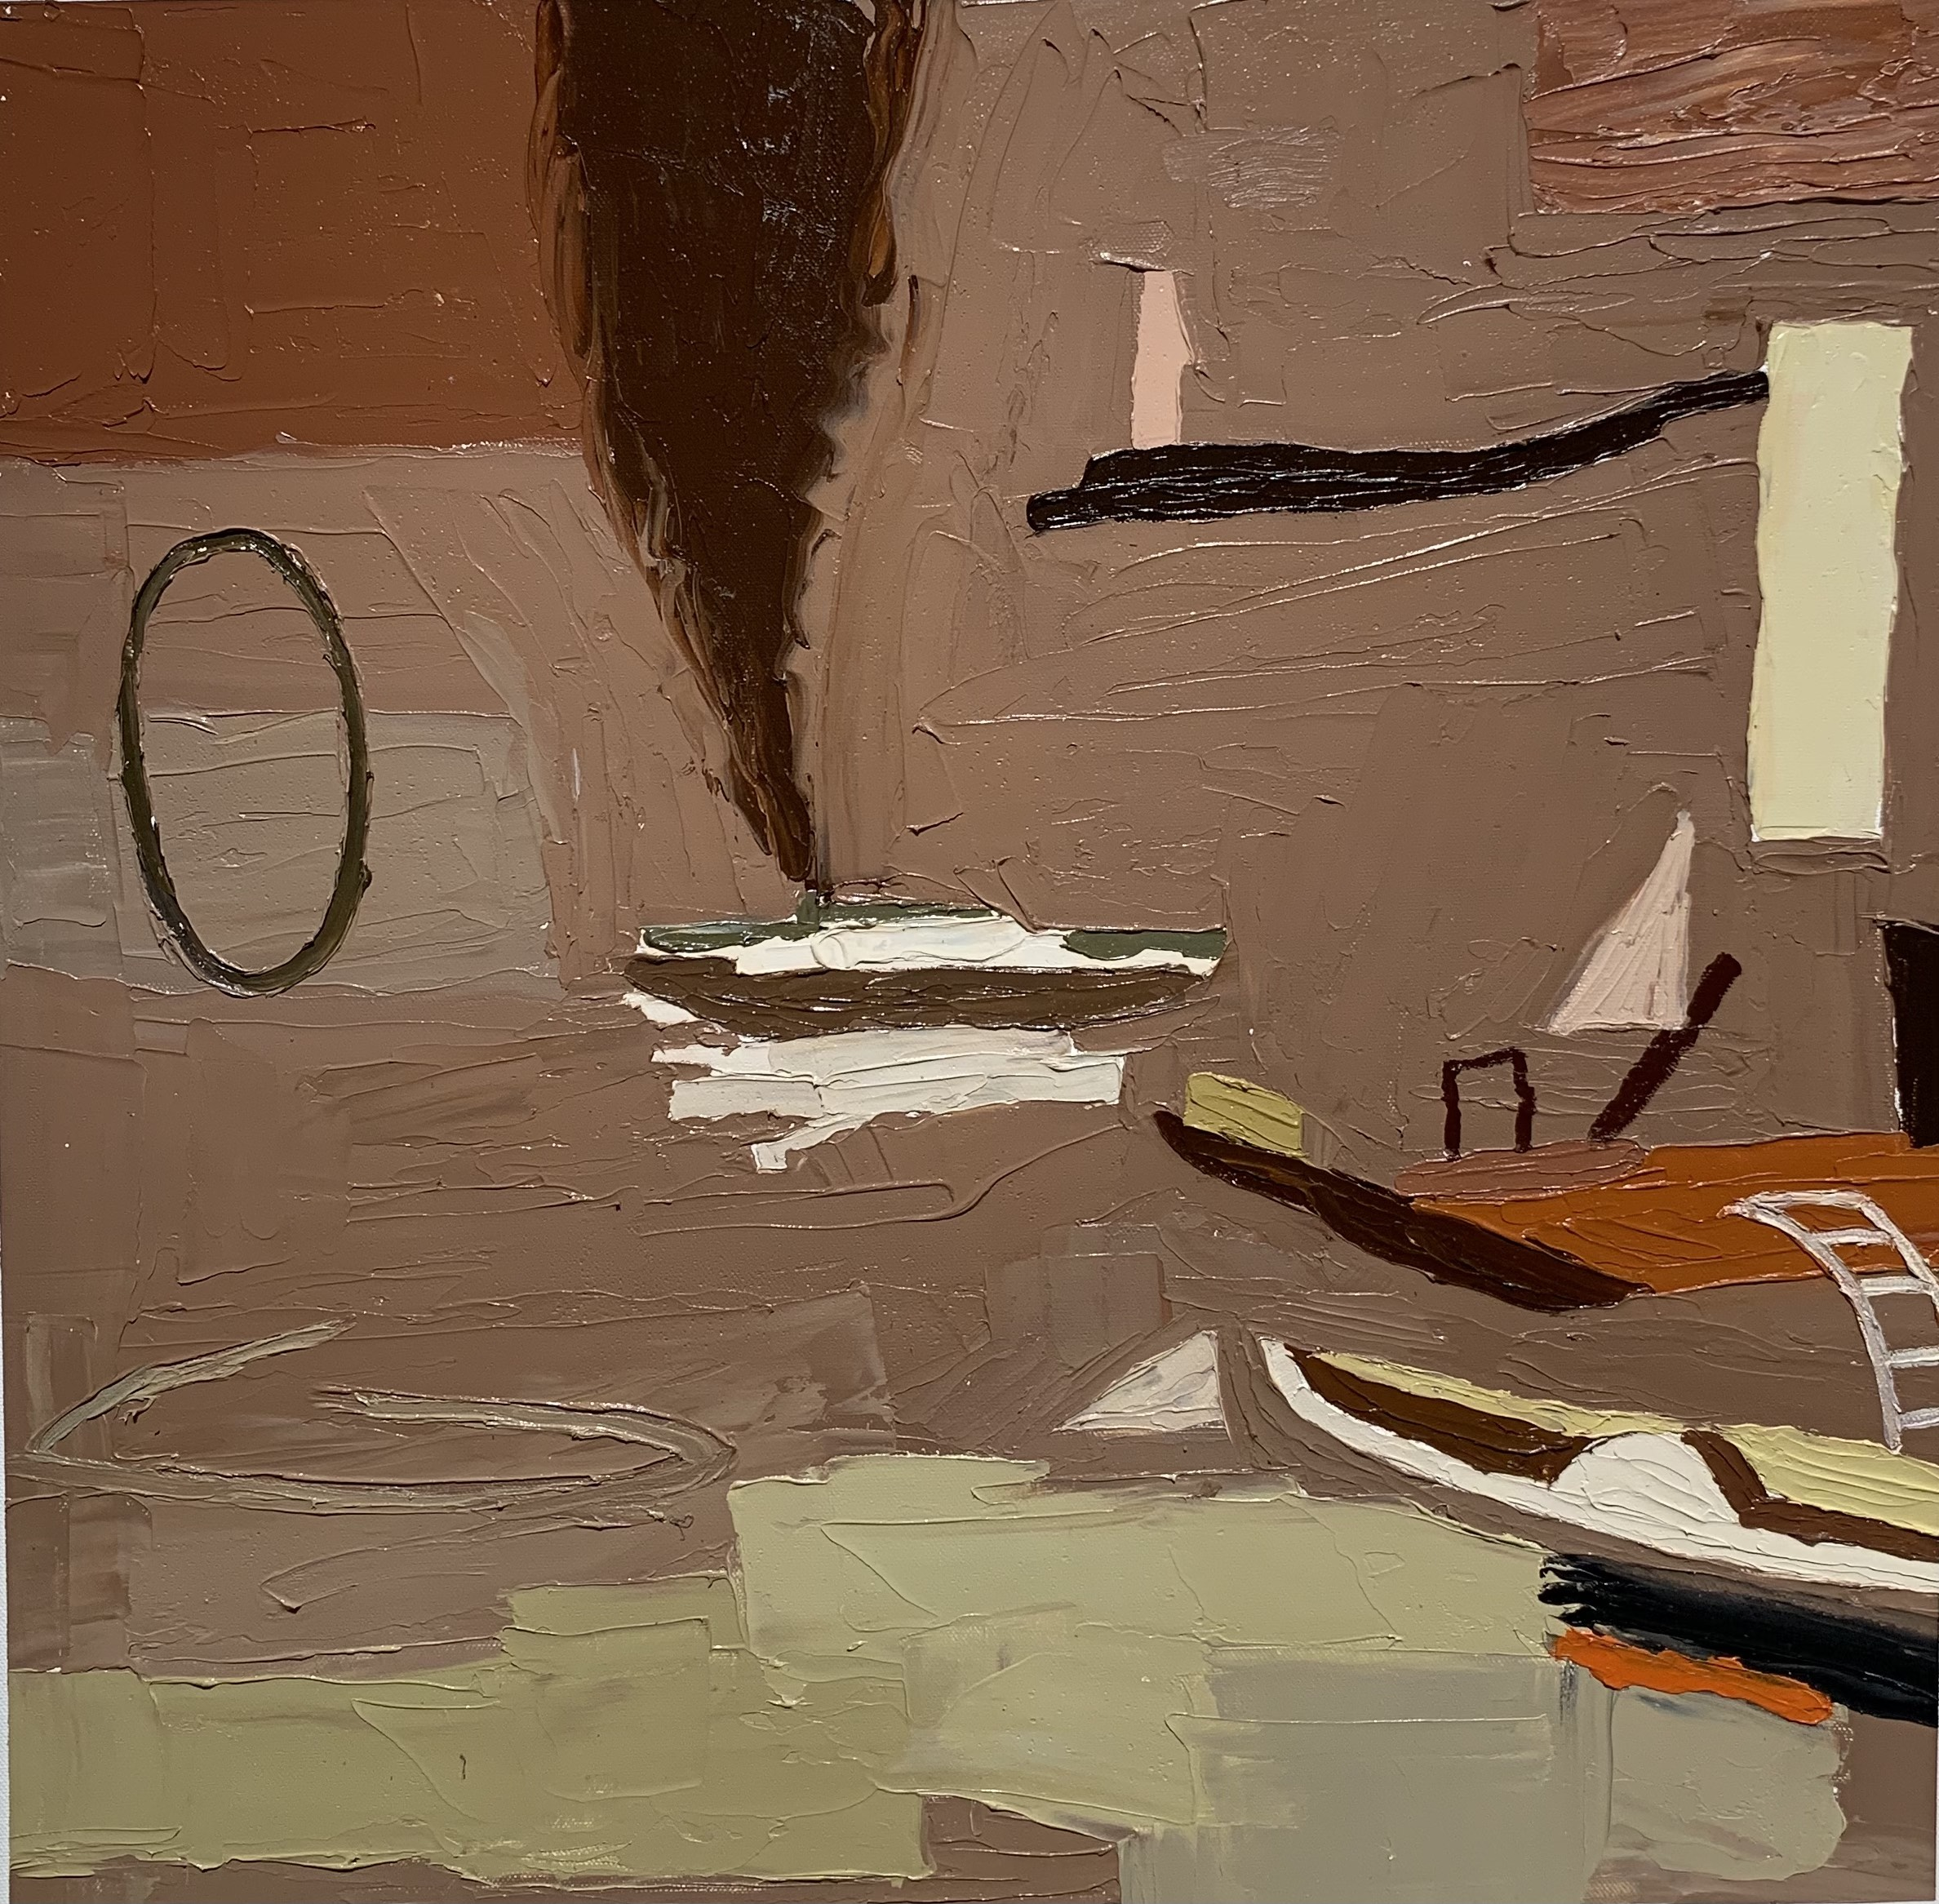 artists/ian-pearson